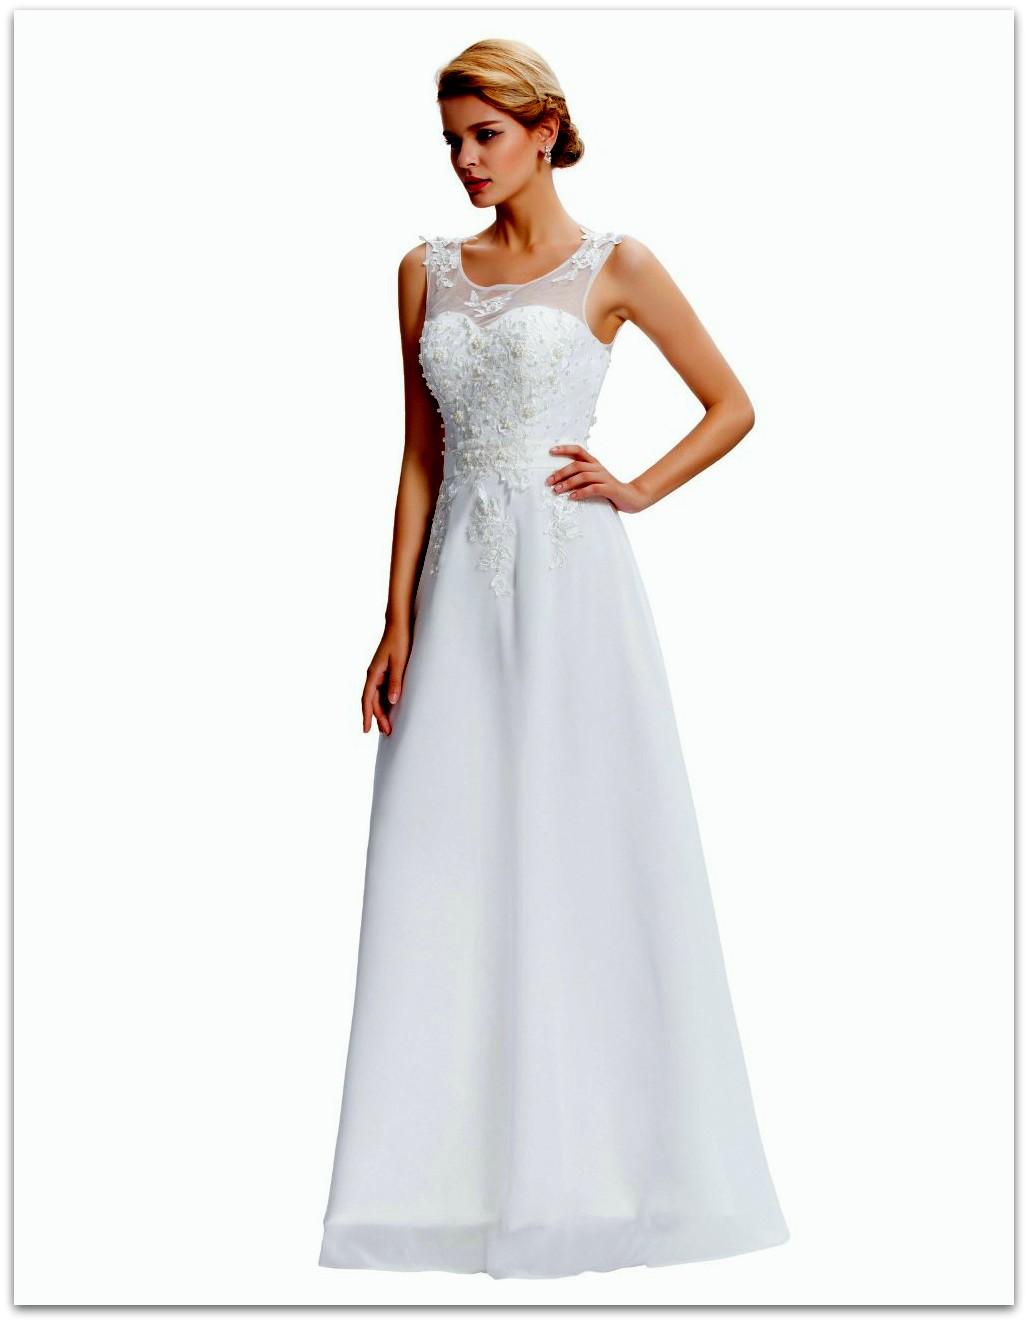 GRACE KARIN Svatební ŠATY dlouhé GK 7555 bílá XXS - 3XL (skladem  XS 2ecd8bc980